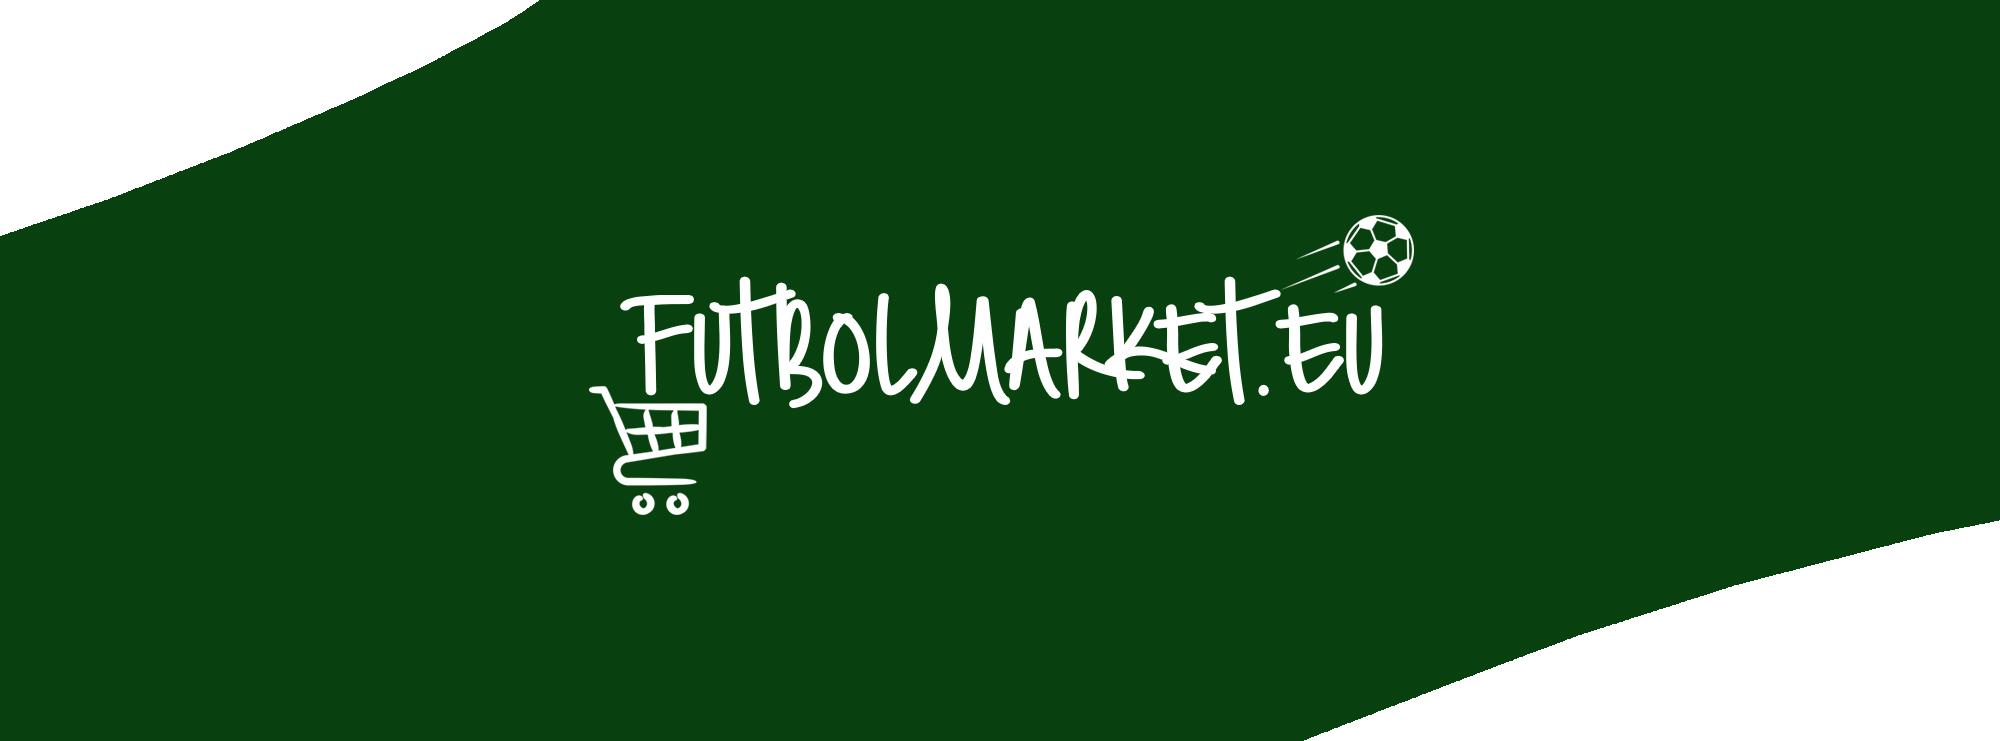 FutbolMarket.eu